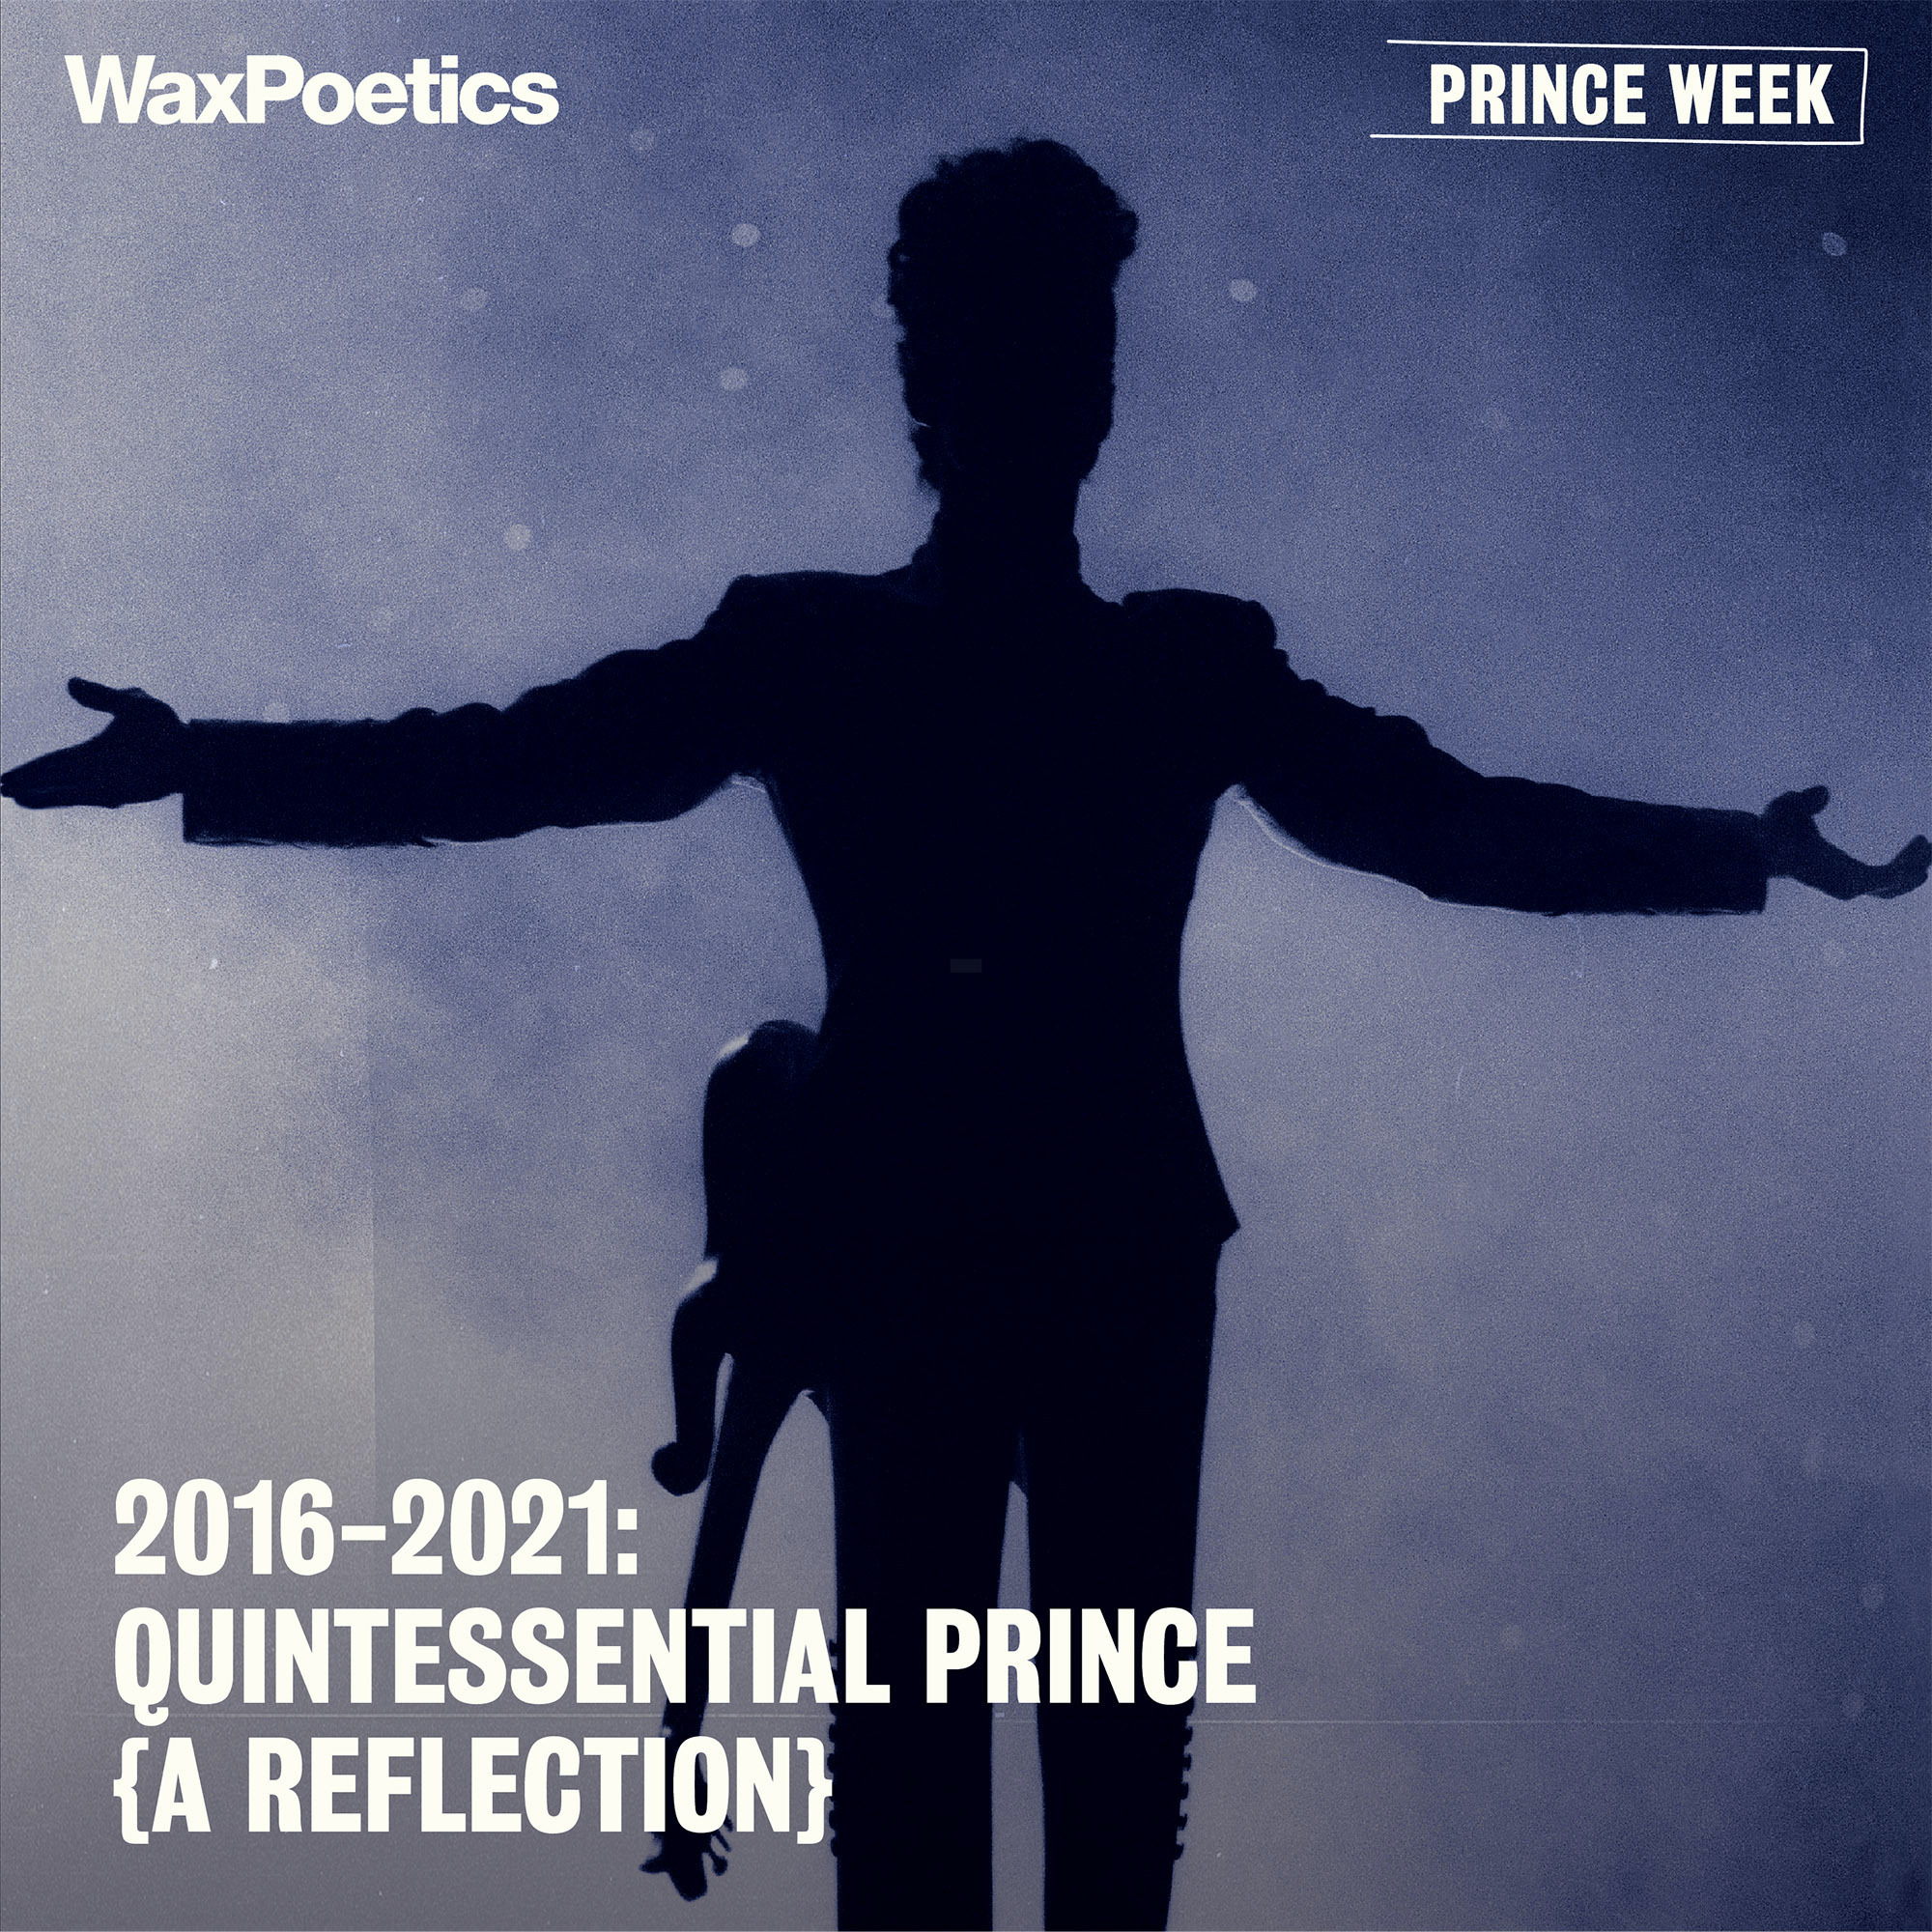 2016-2021: Quintessential Prince